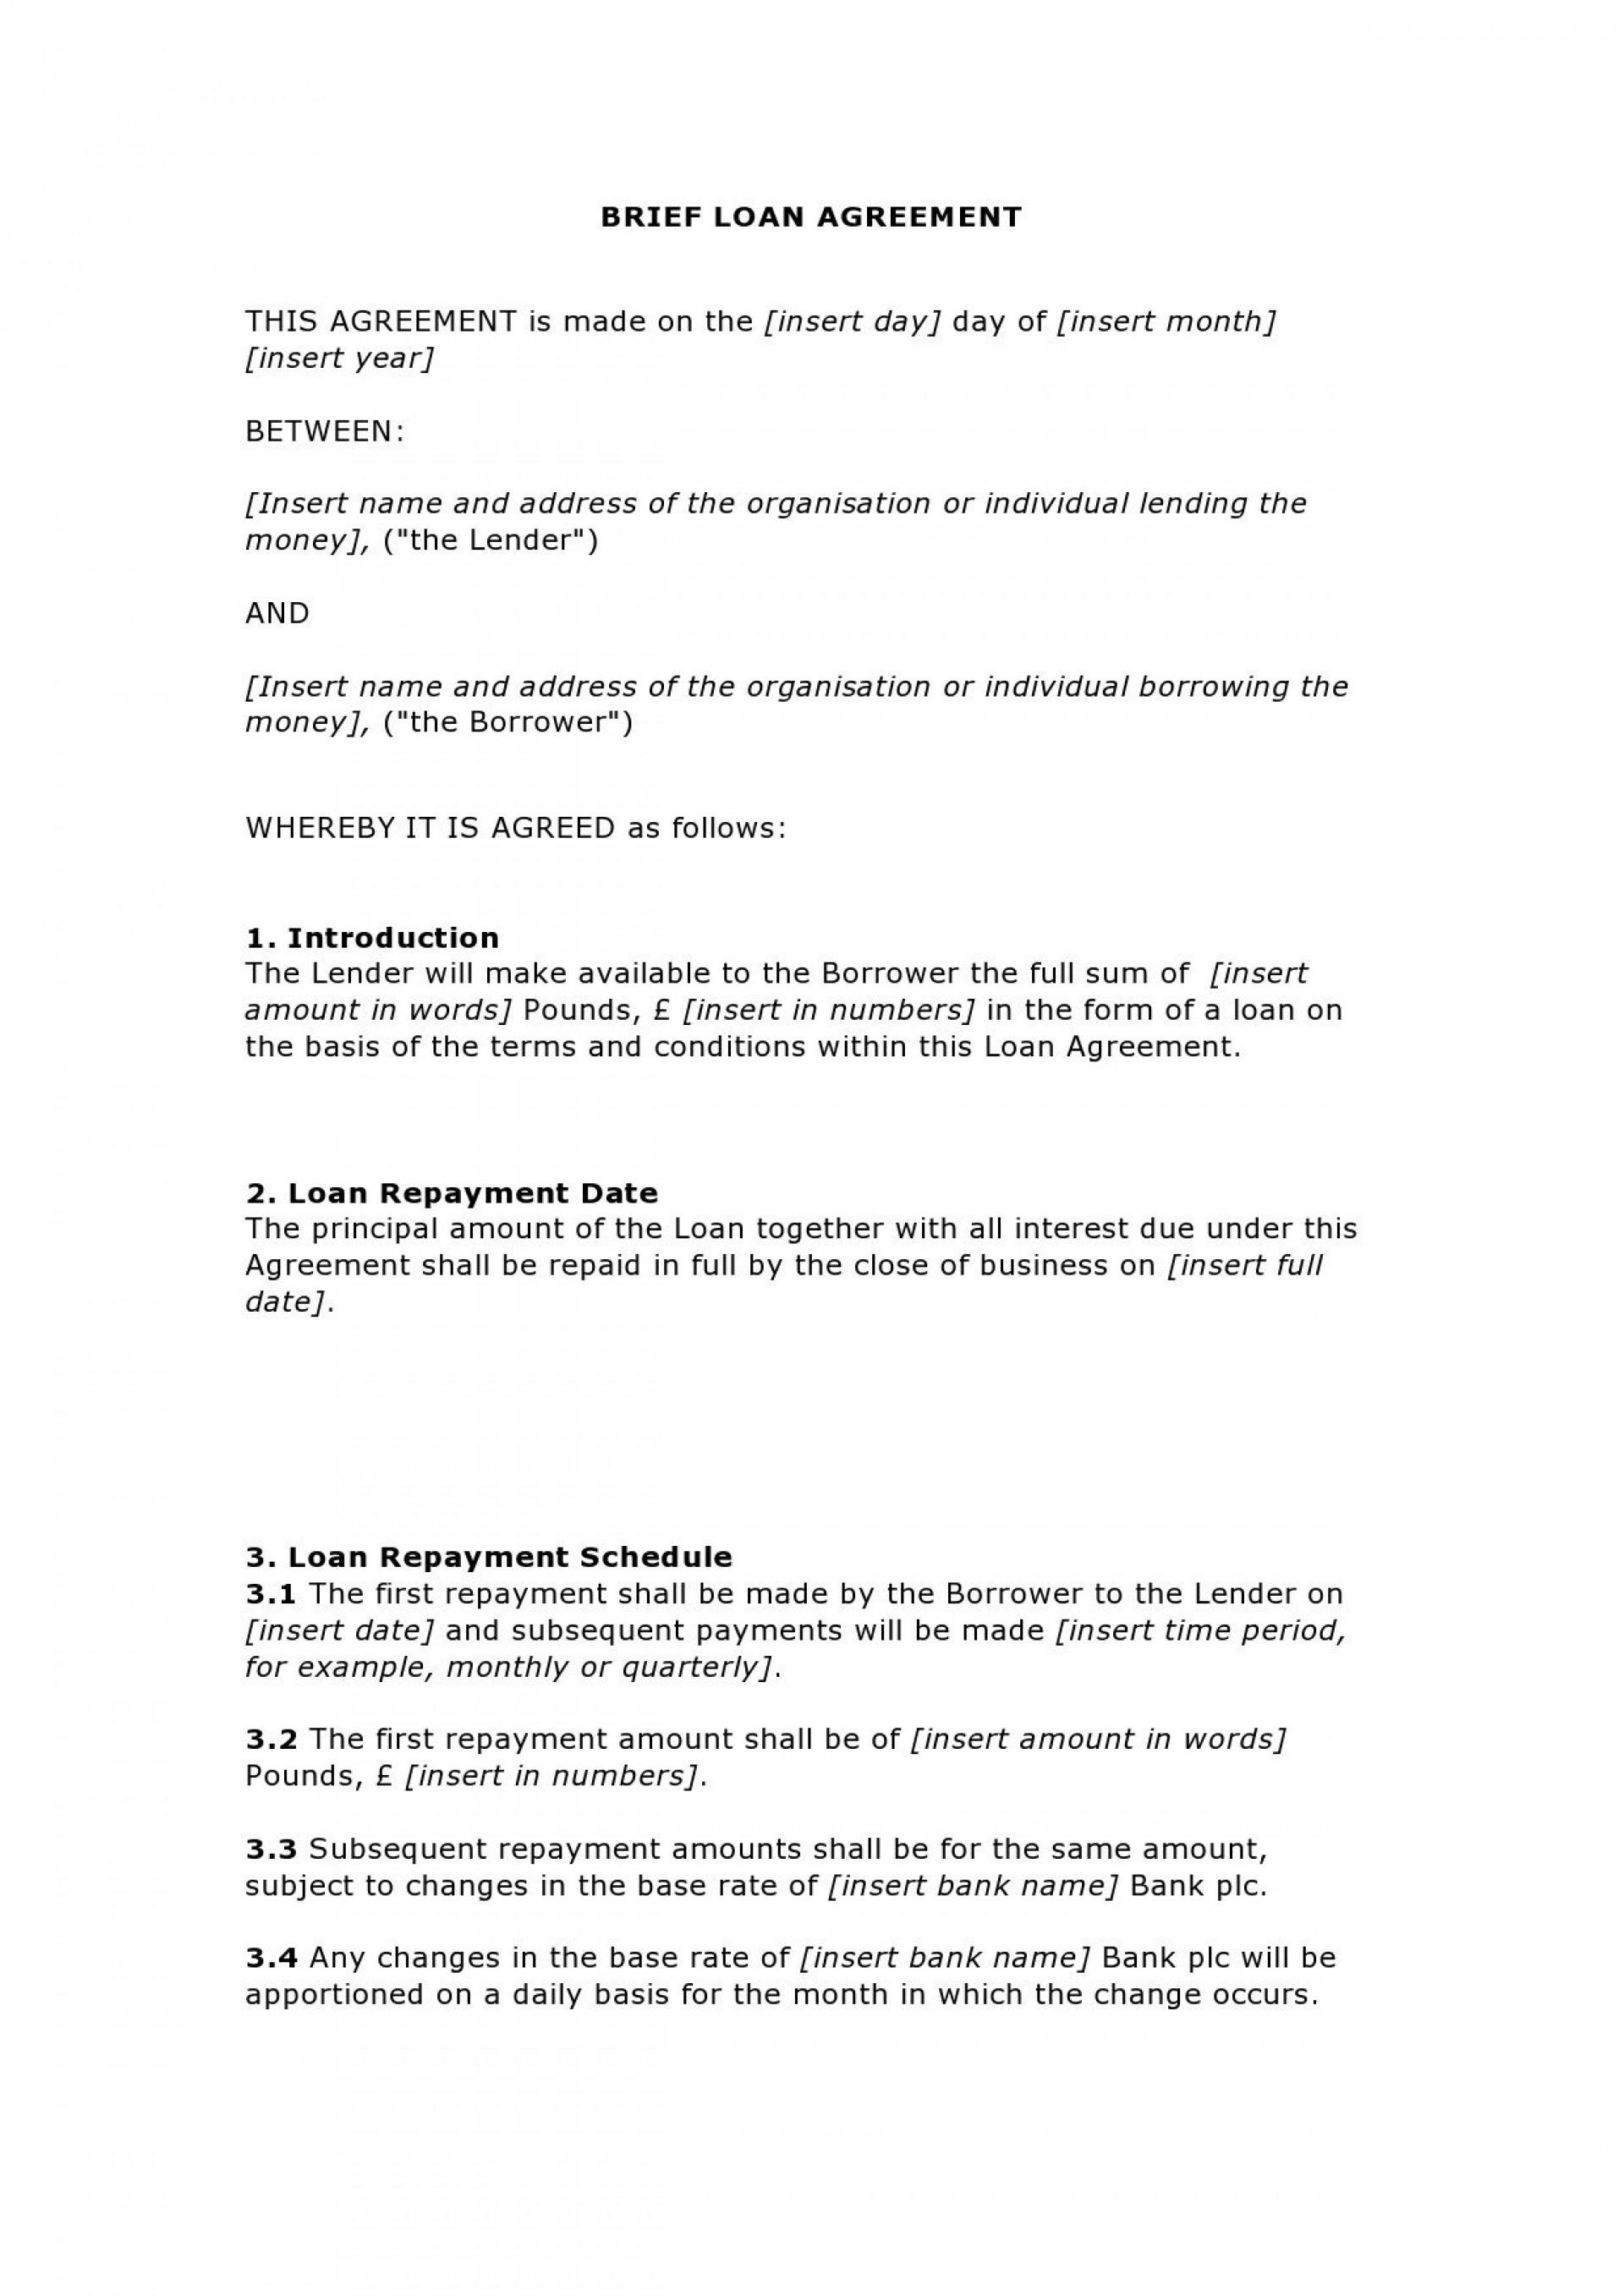 003 Sensational Free Family Loan Agreement Template Nz Highest Clarity 1920